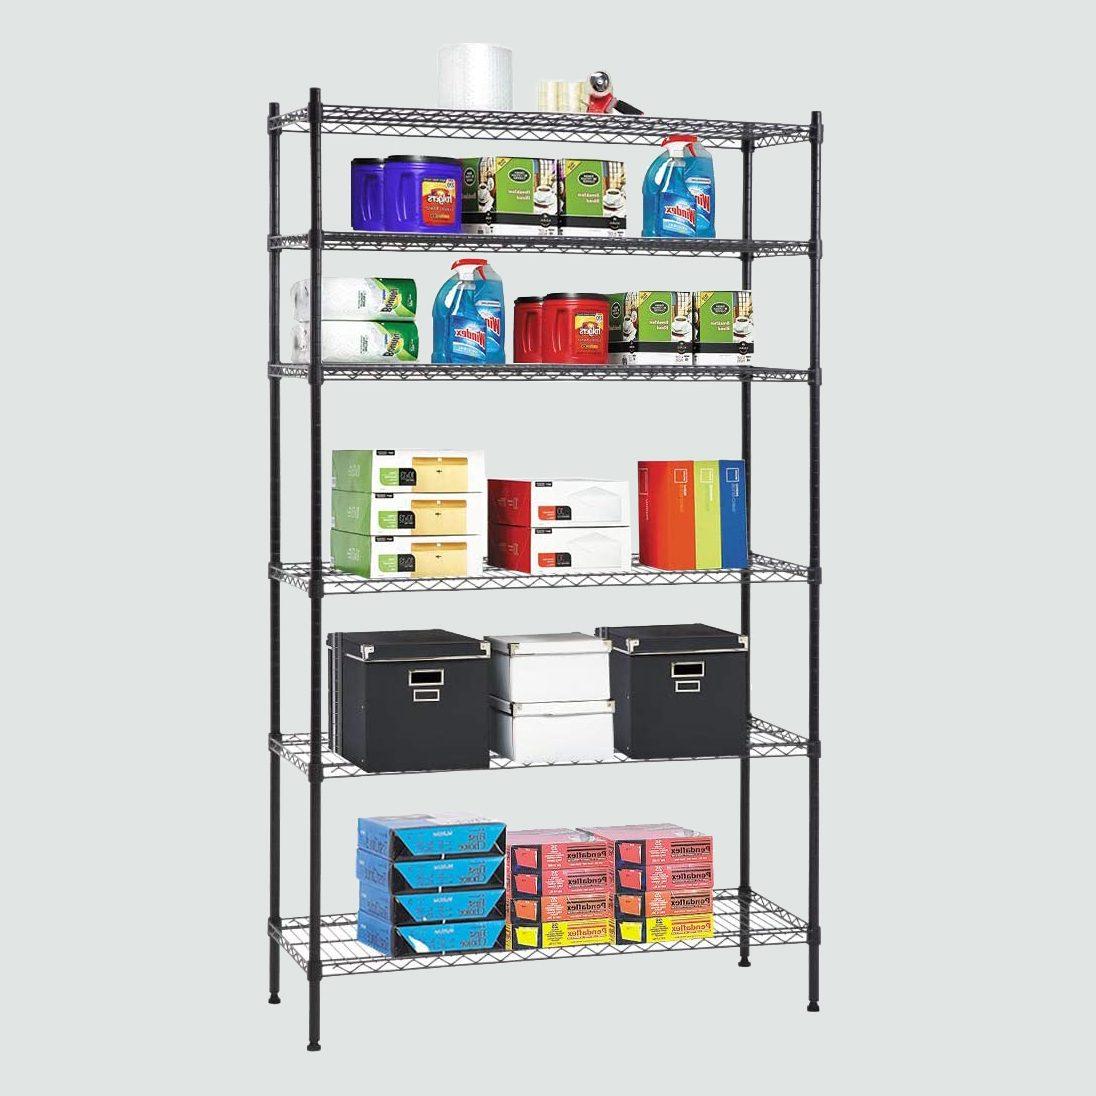 Food storage racks for keeping essentials